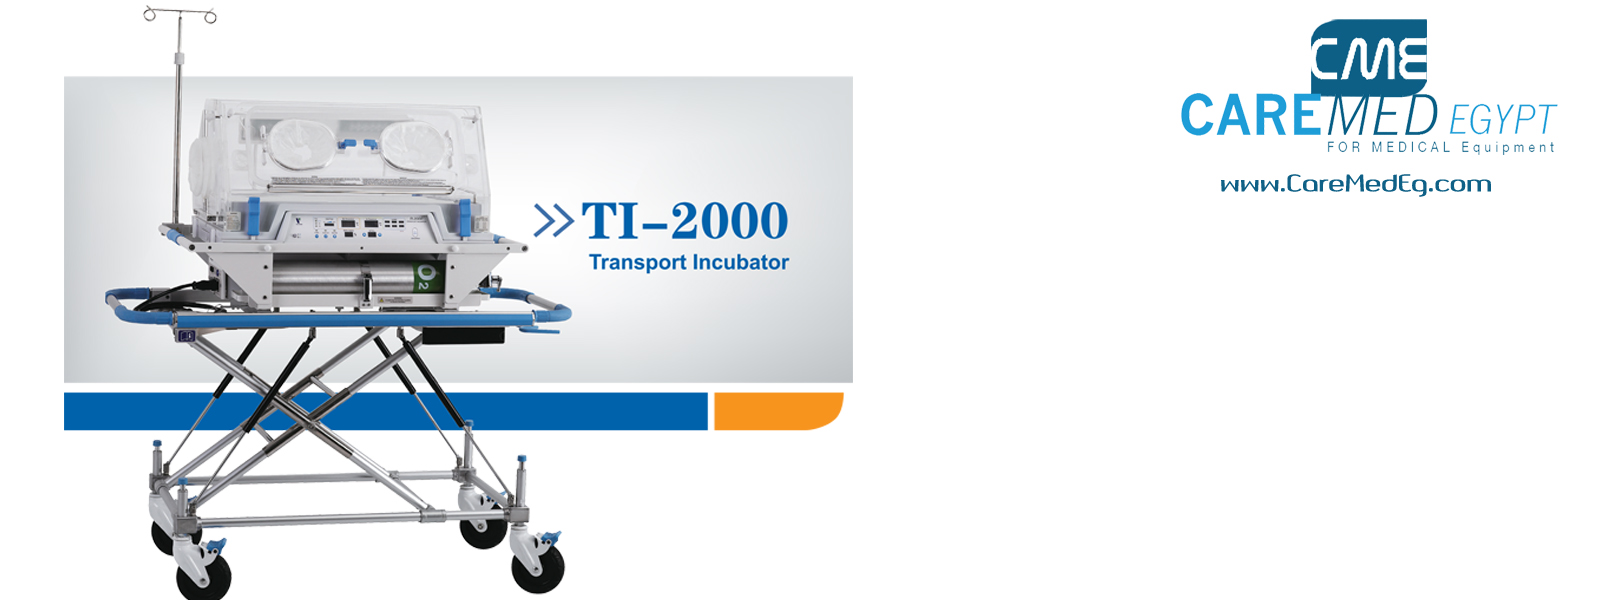 TI -2000 Transport Incubator